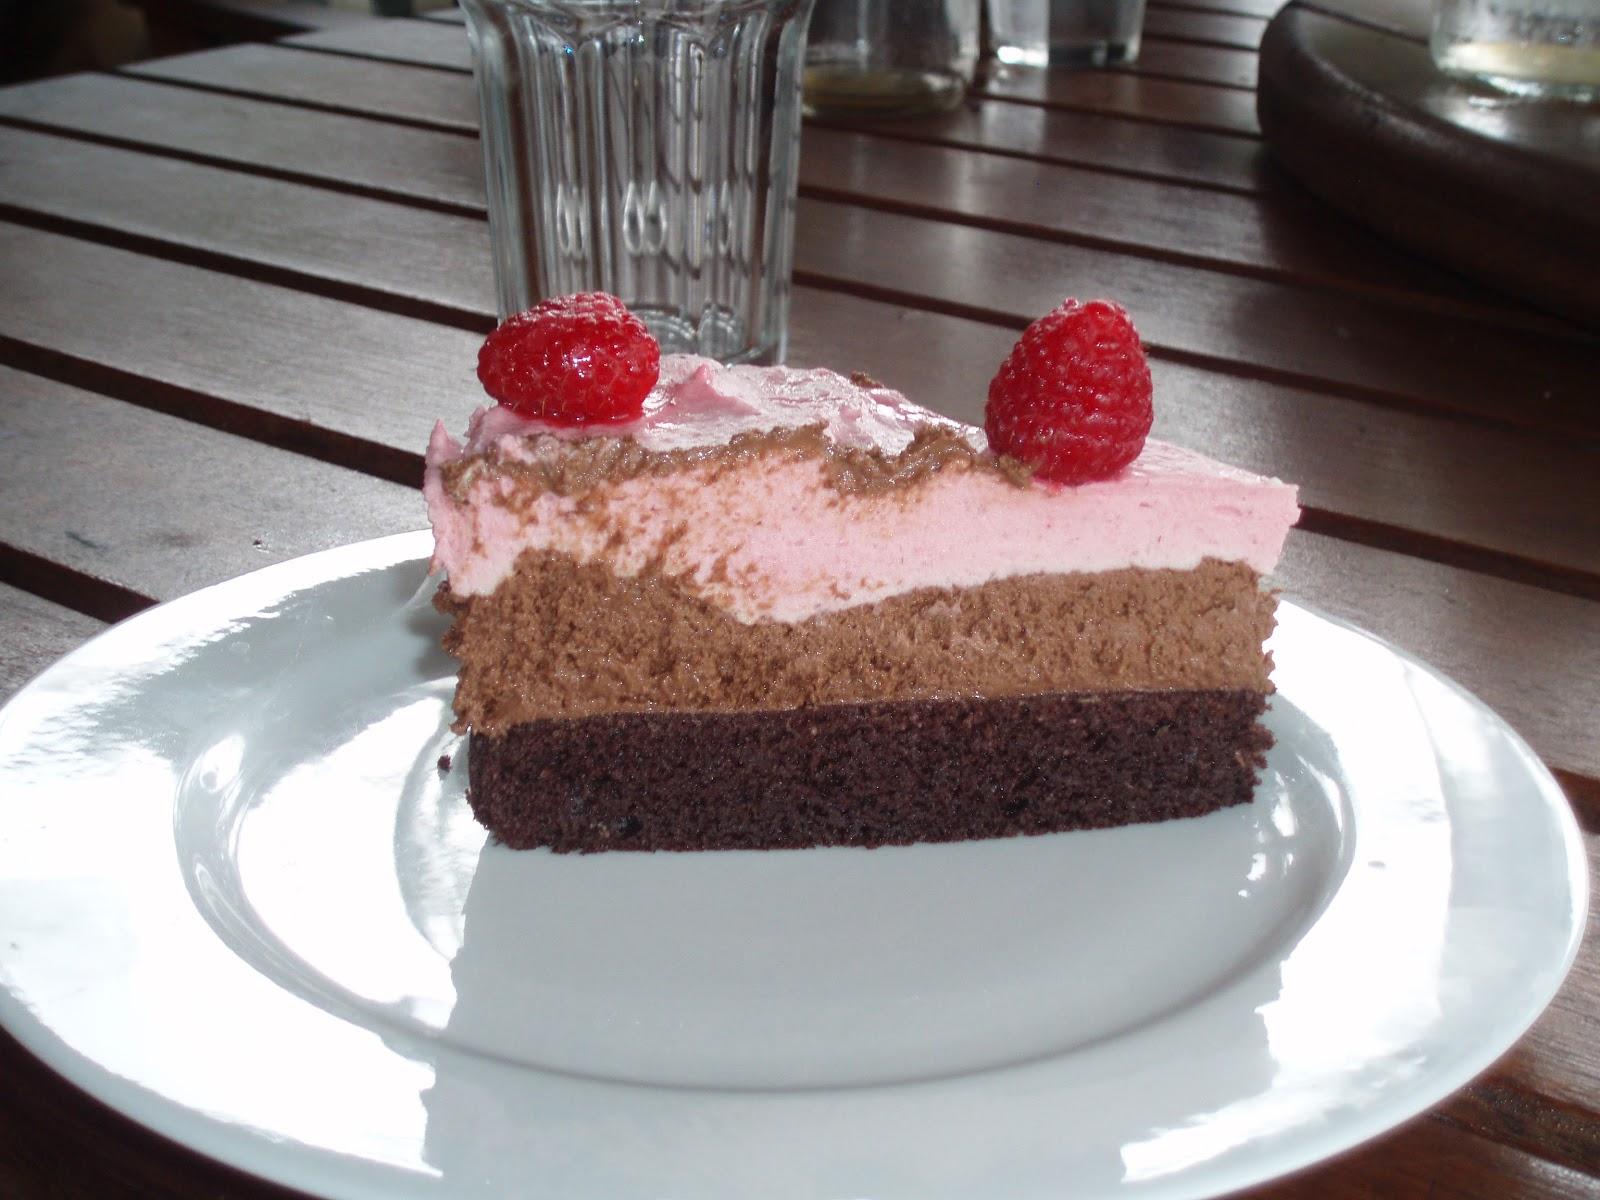 Keto Cake Recipe Australia: My Aussie LCHF Life: Birthday Cake